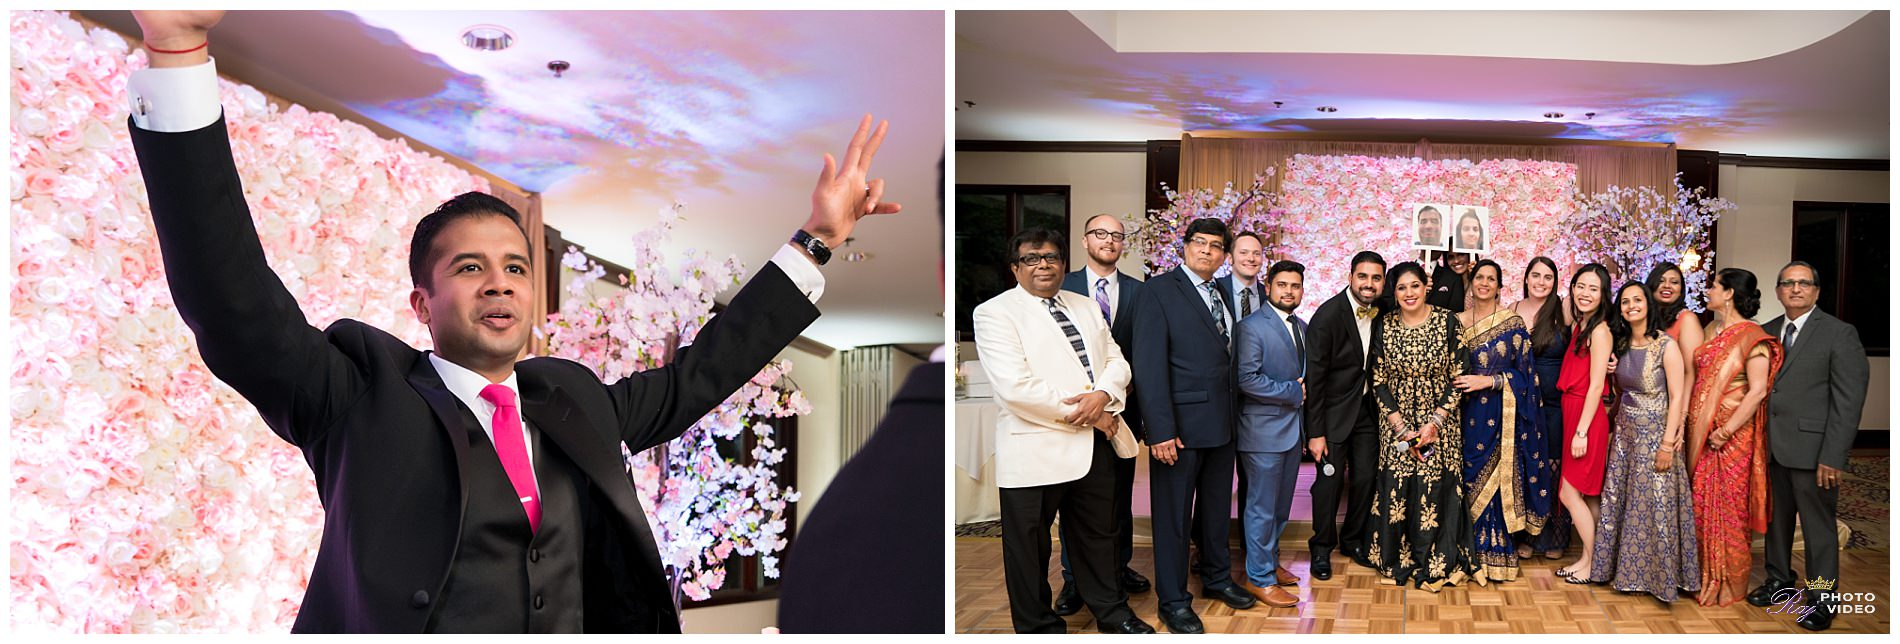 Martinsville-Gardens-NJ-Indian-Wedding-Ruchi-Vishal-65.jpg